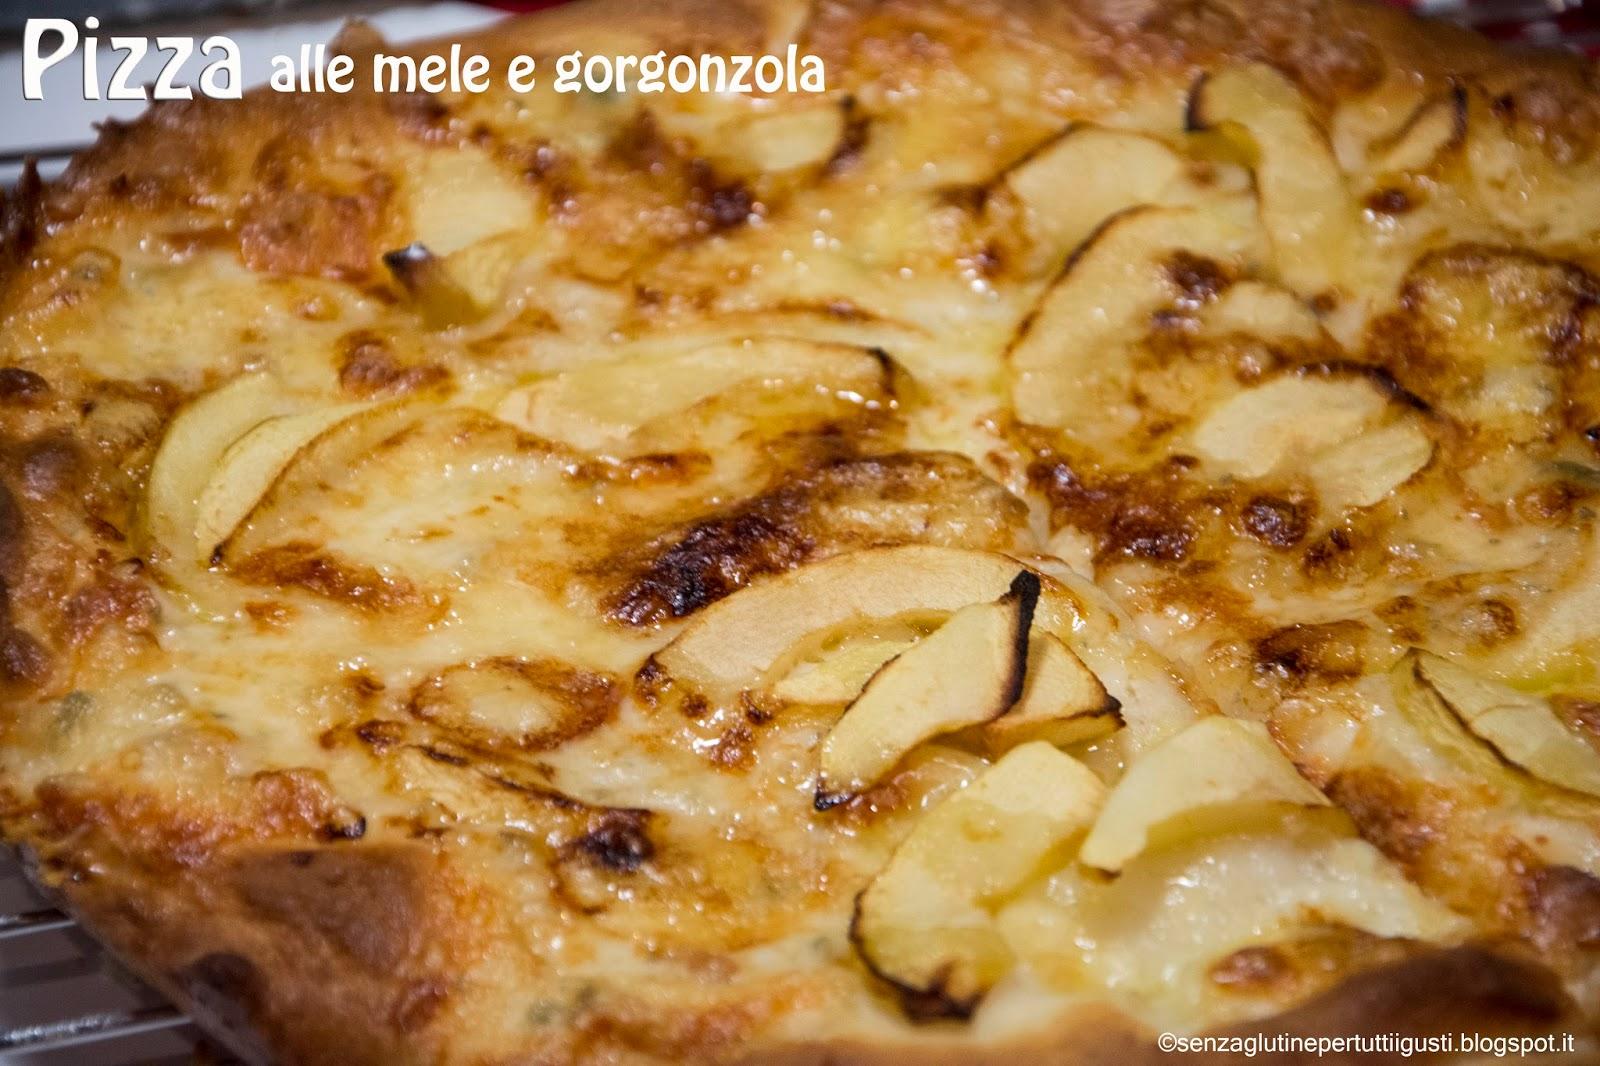 Senza Glutine Per Tutti I Gusti!: Pizza Senza Glutine Al Gorgonzola  #794111 1600 1066 Cucina Mediterranea Senza Glutine Pdf